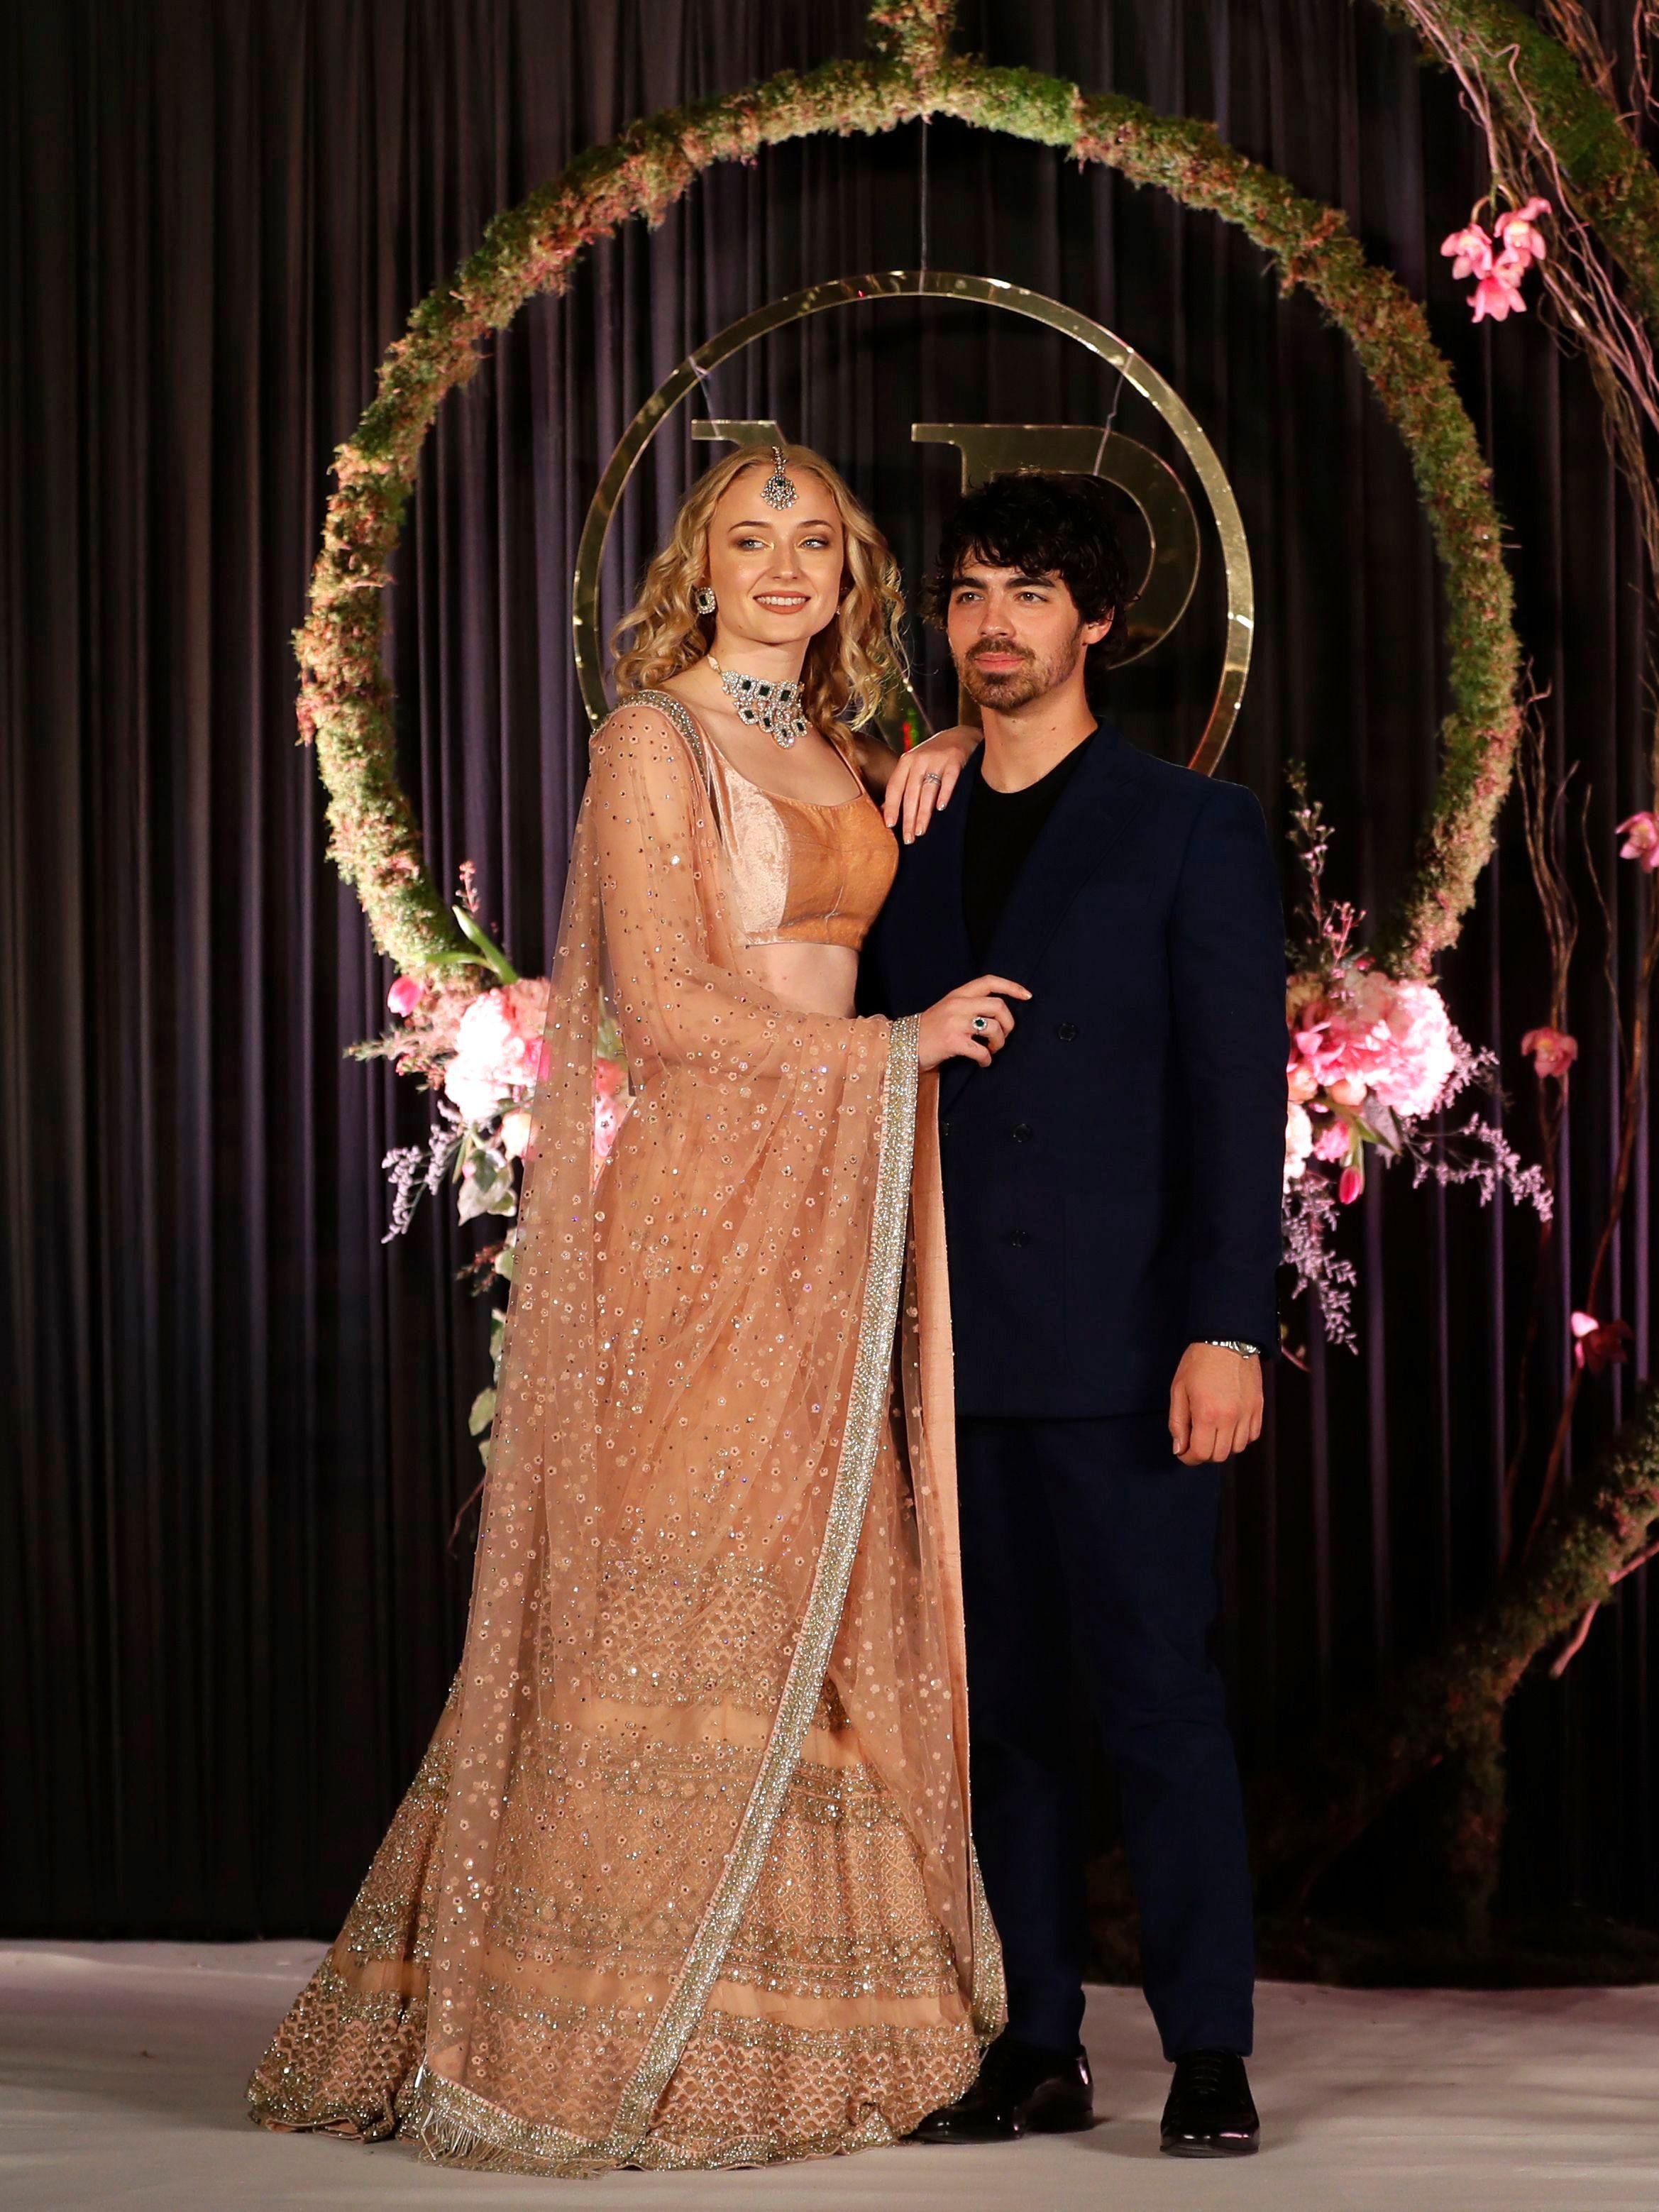 See Sophie Turners Reception Dress For Nick Jonas And Priyanka